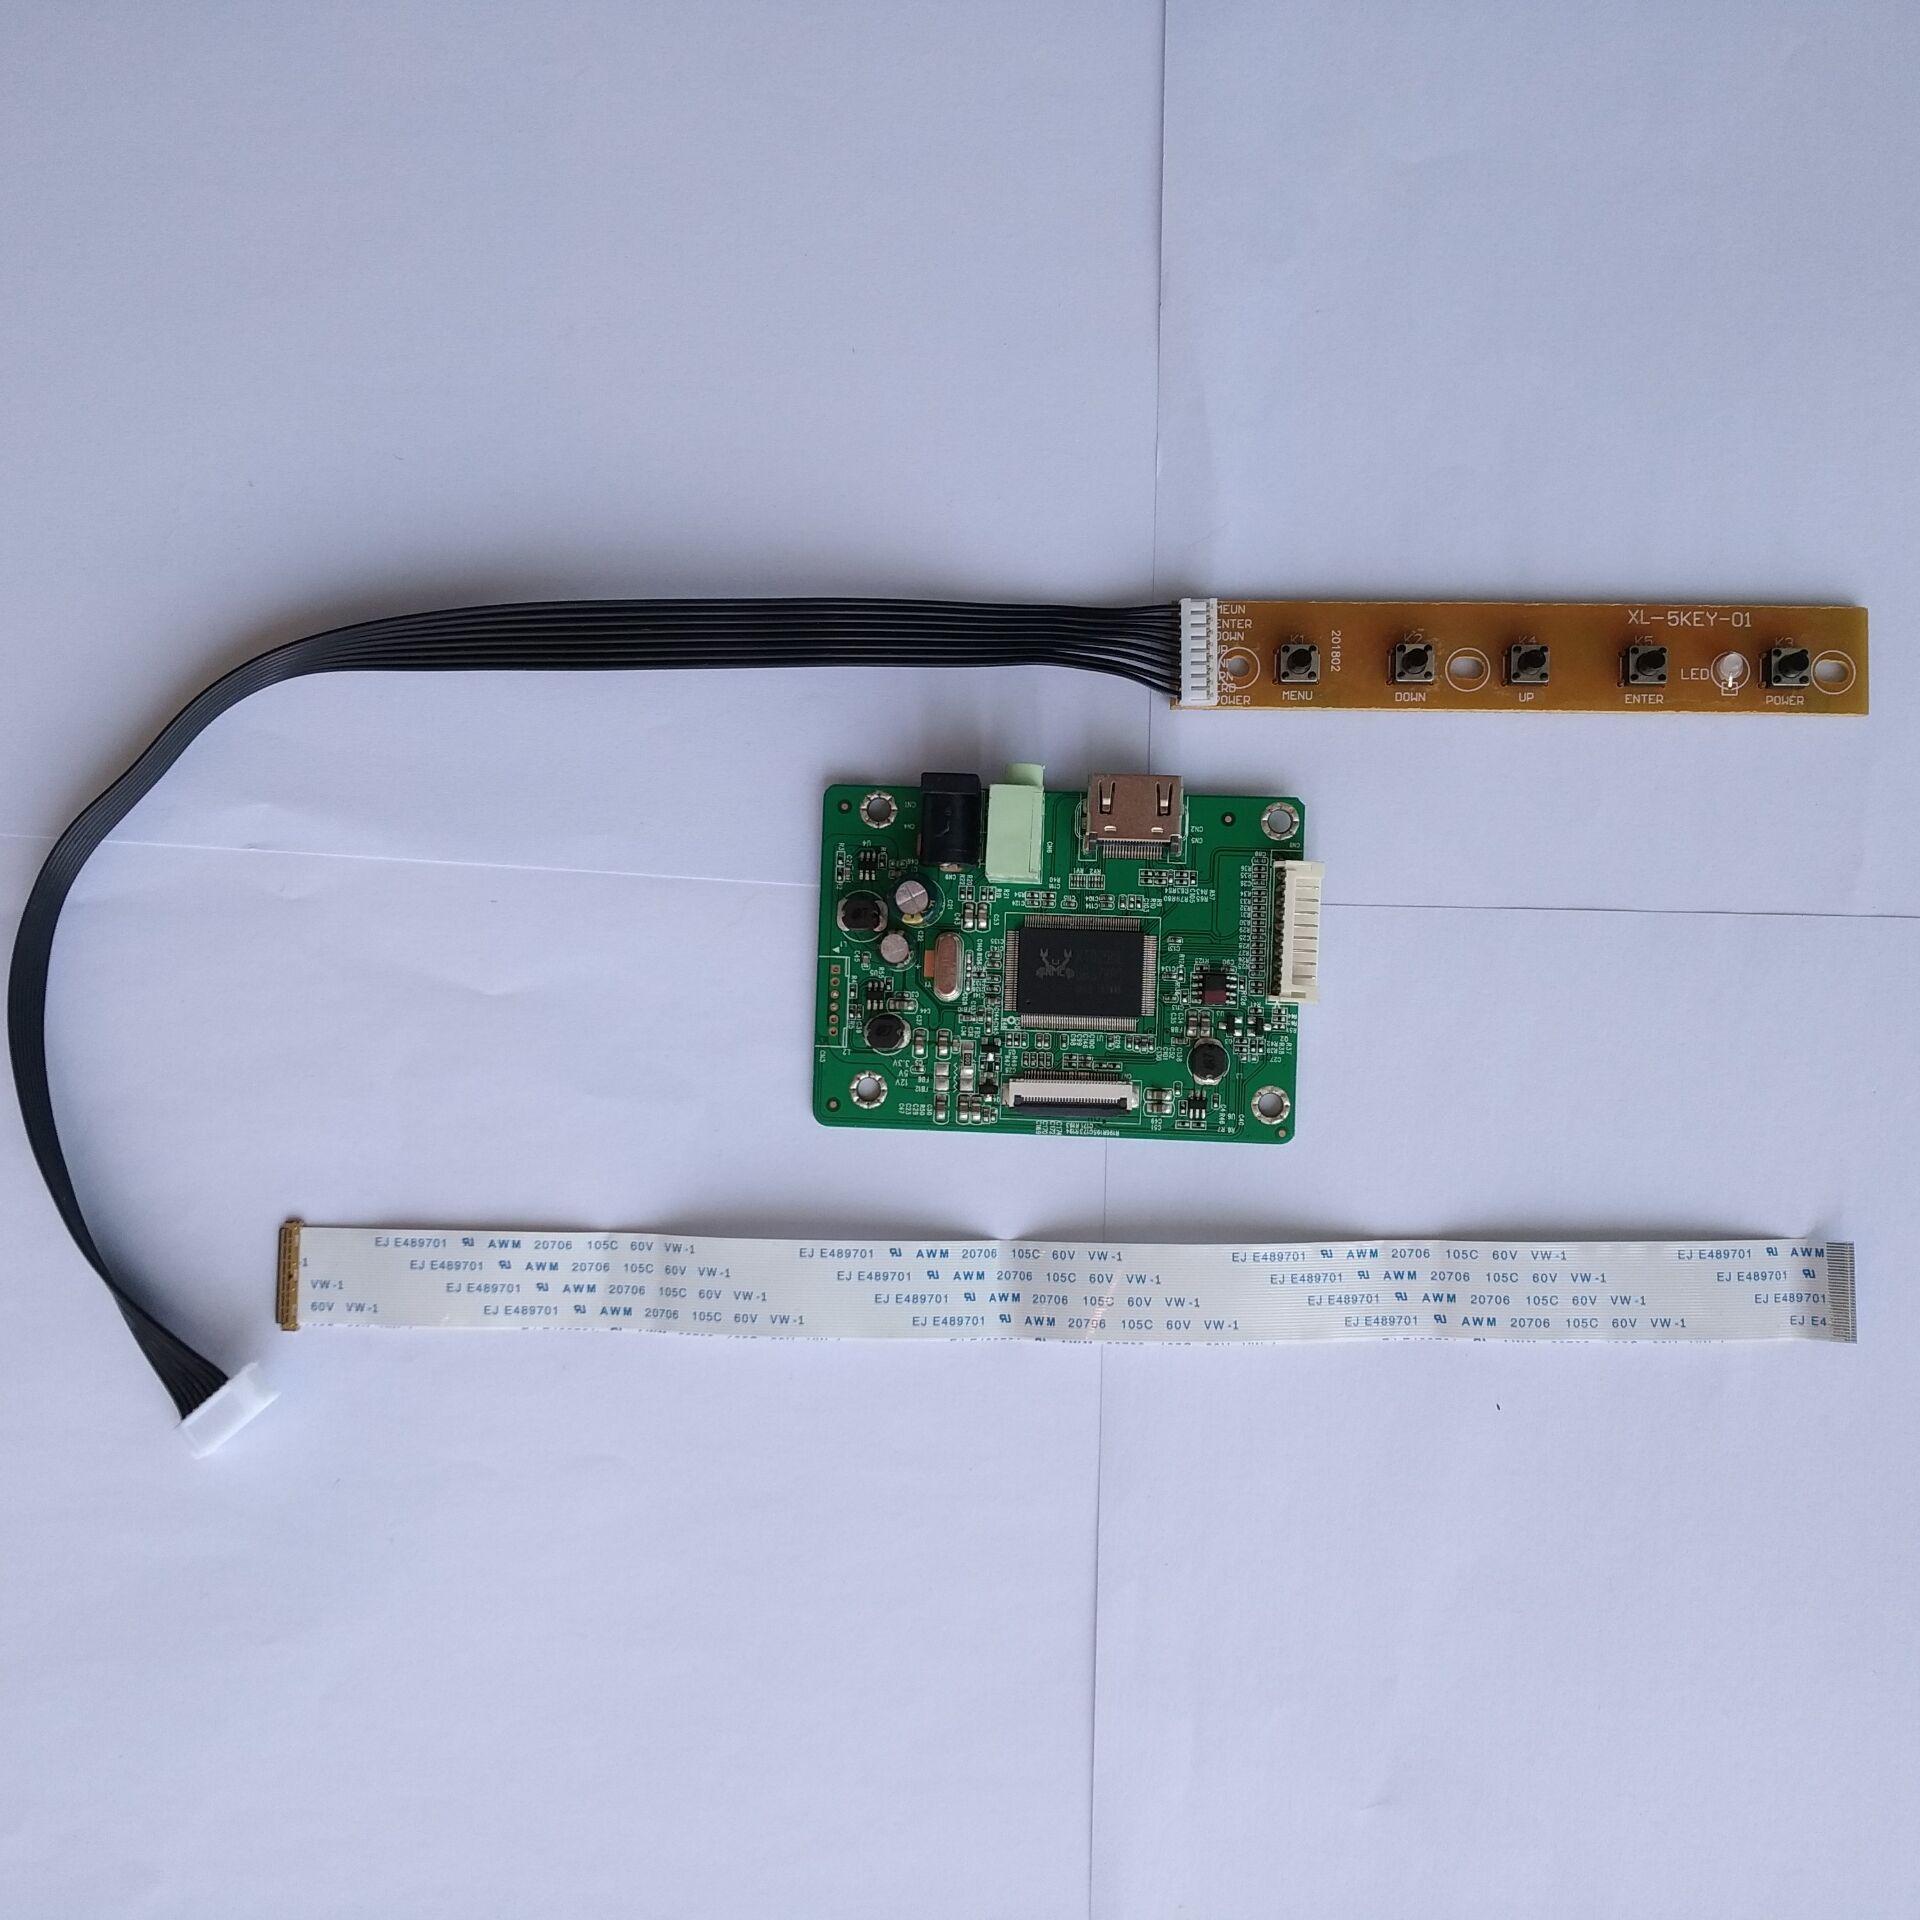 LCD LED EDP البسيطة تحكم لوحة للقيادة ل N133HCE-GN2 N133HCE-GP1 N133HCE-GP2 1920X1080 لوحة